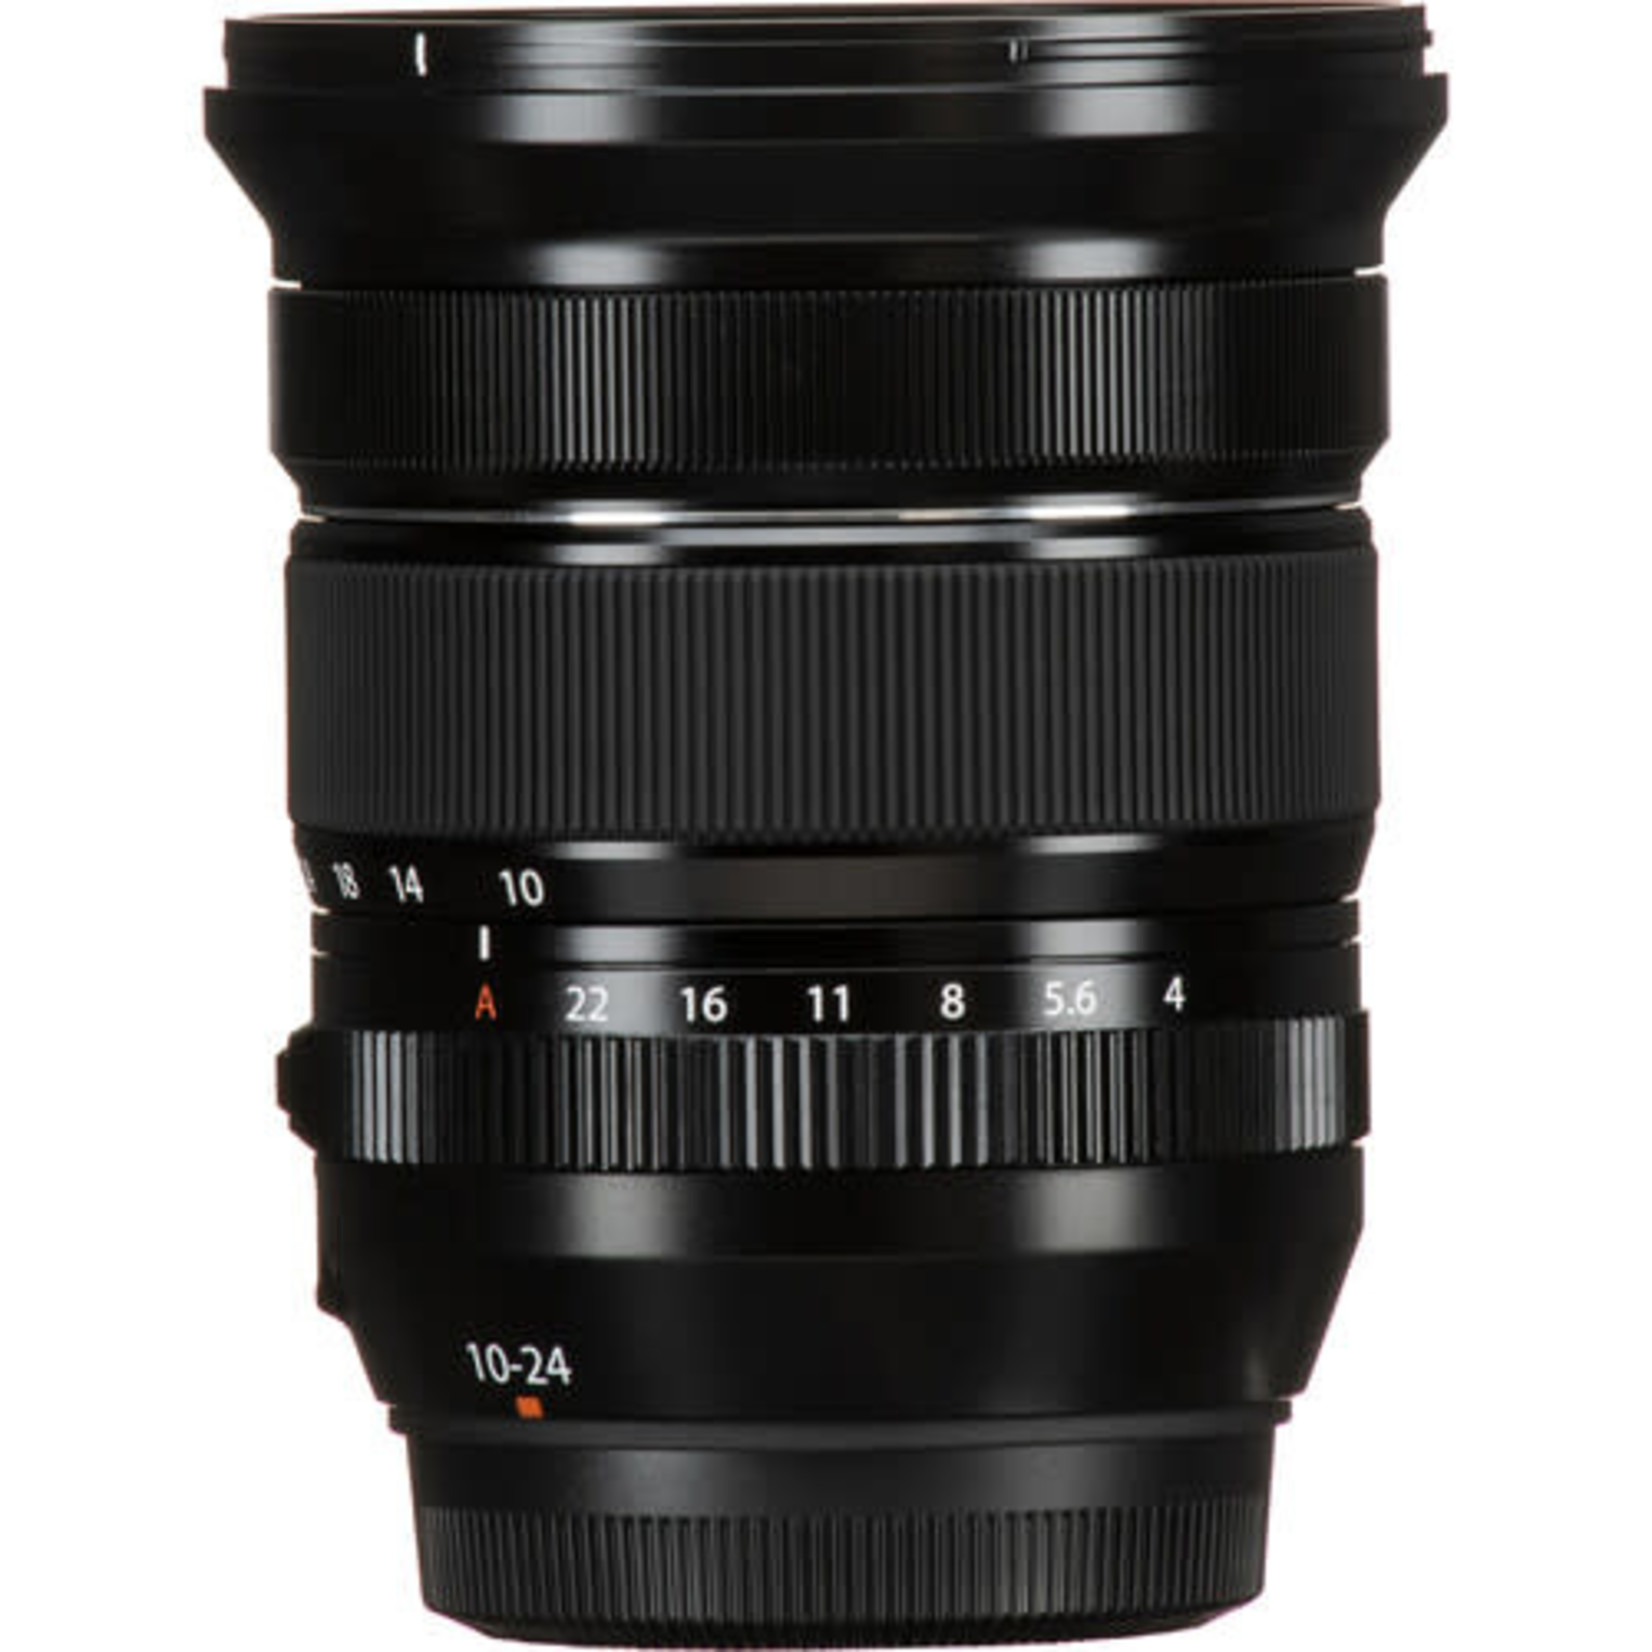 FujiFilm FujiFilm XF 10-24mm f/4 R OIS WR Lens